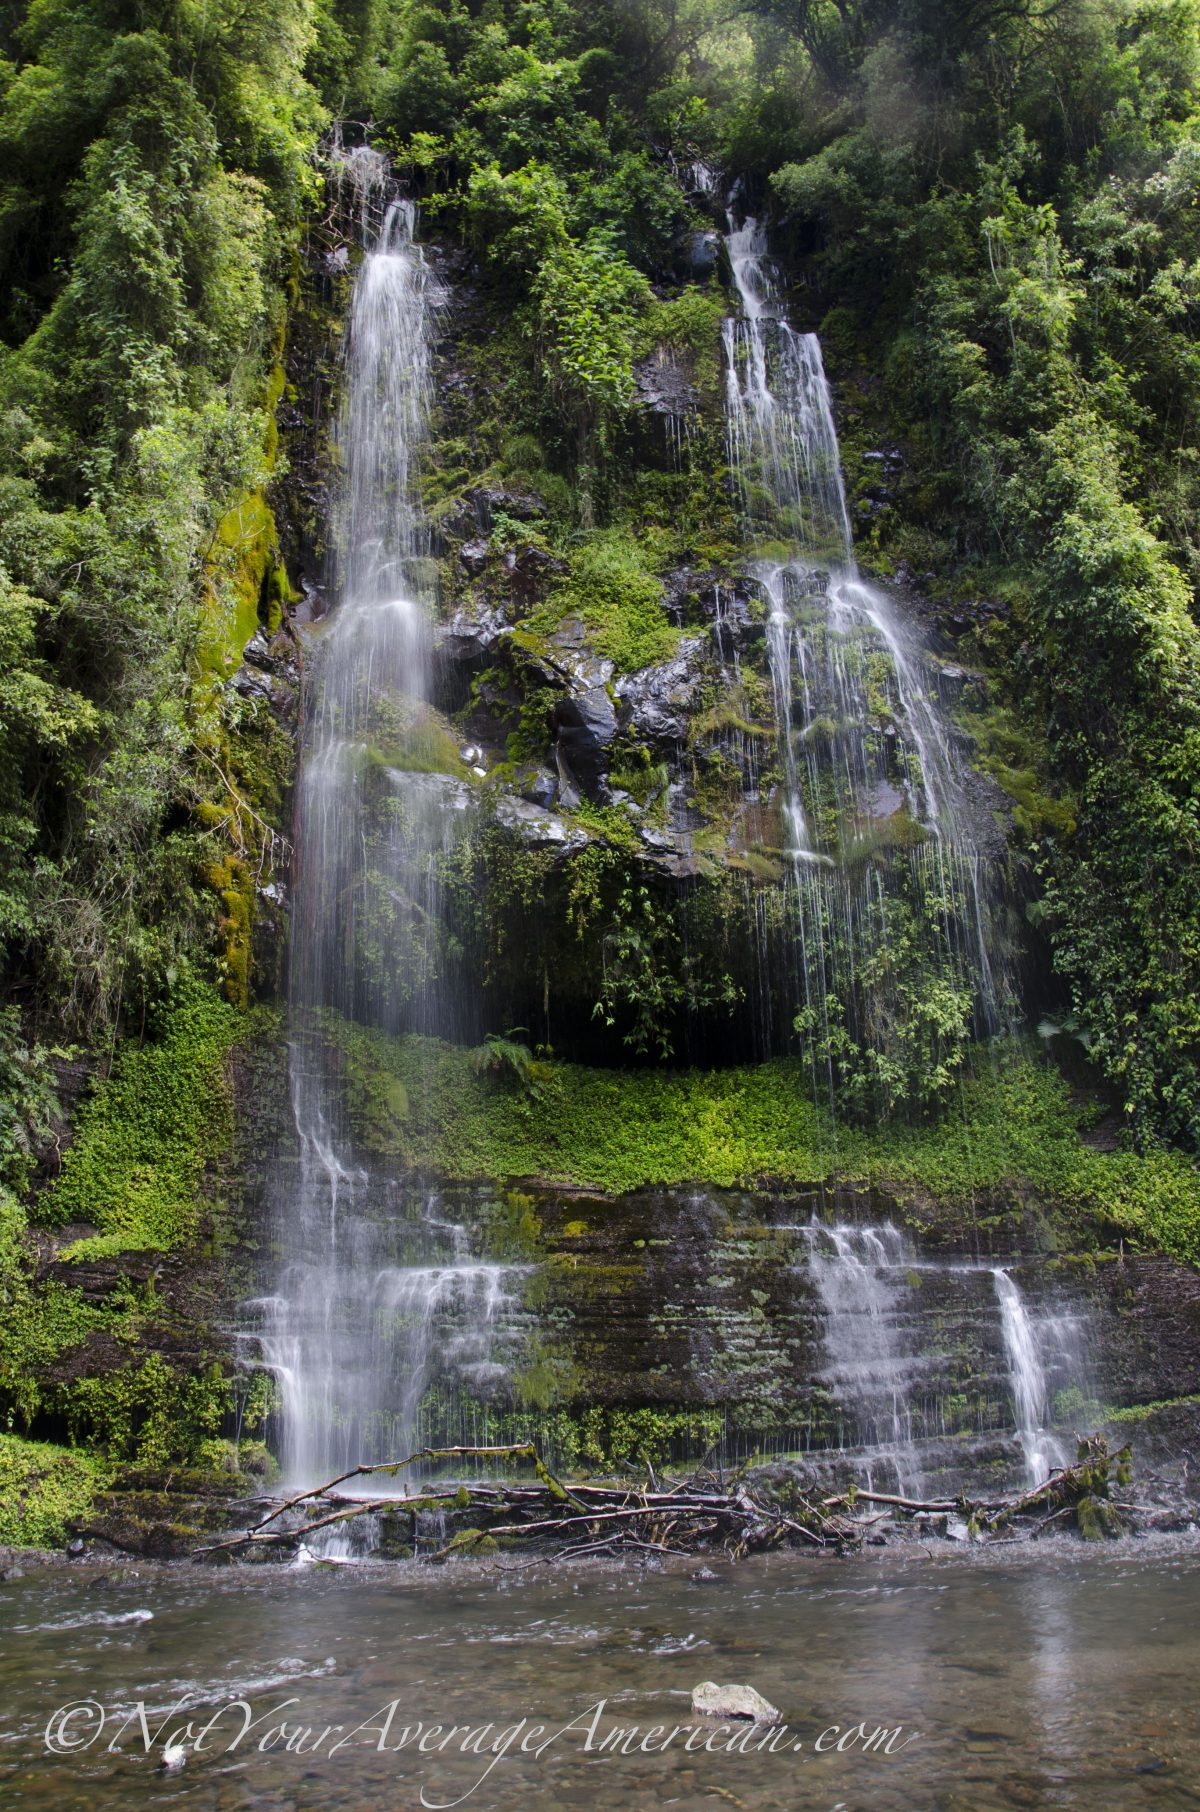 Dripping Water, Cascada Condor Machay, Ecuador